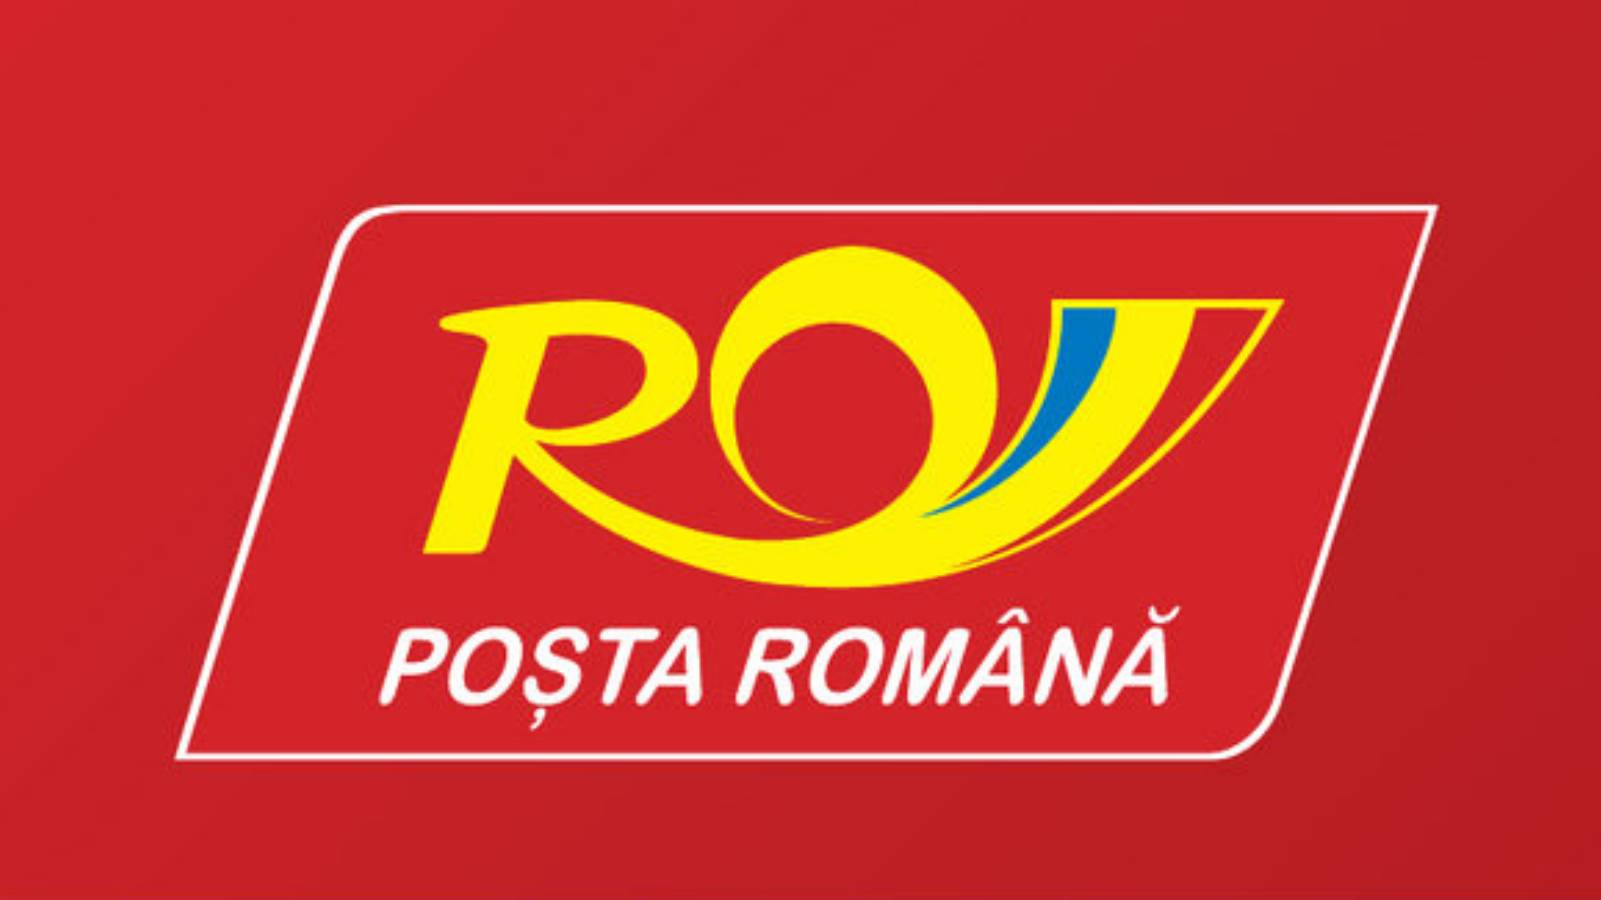 Atentionare Posta Romana program paste